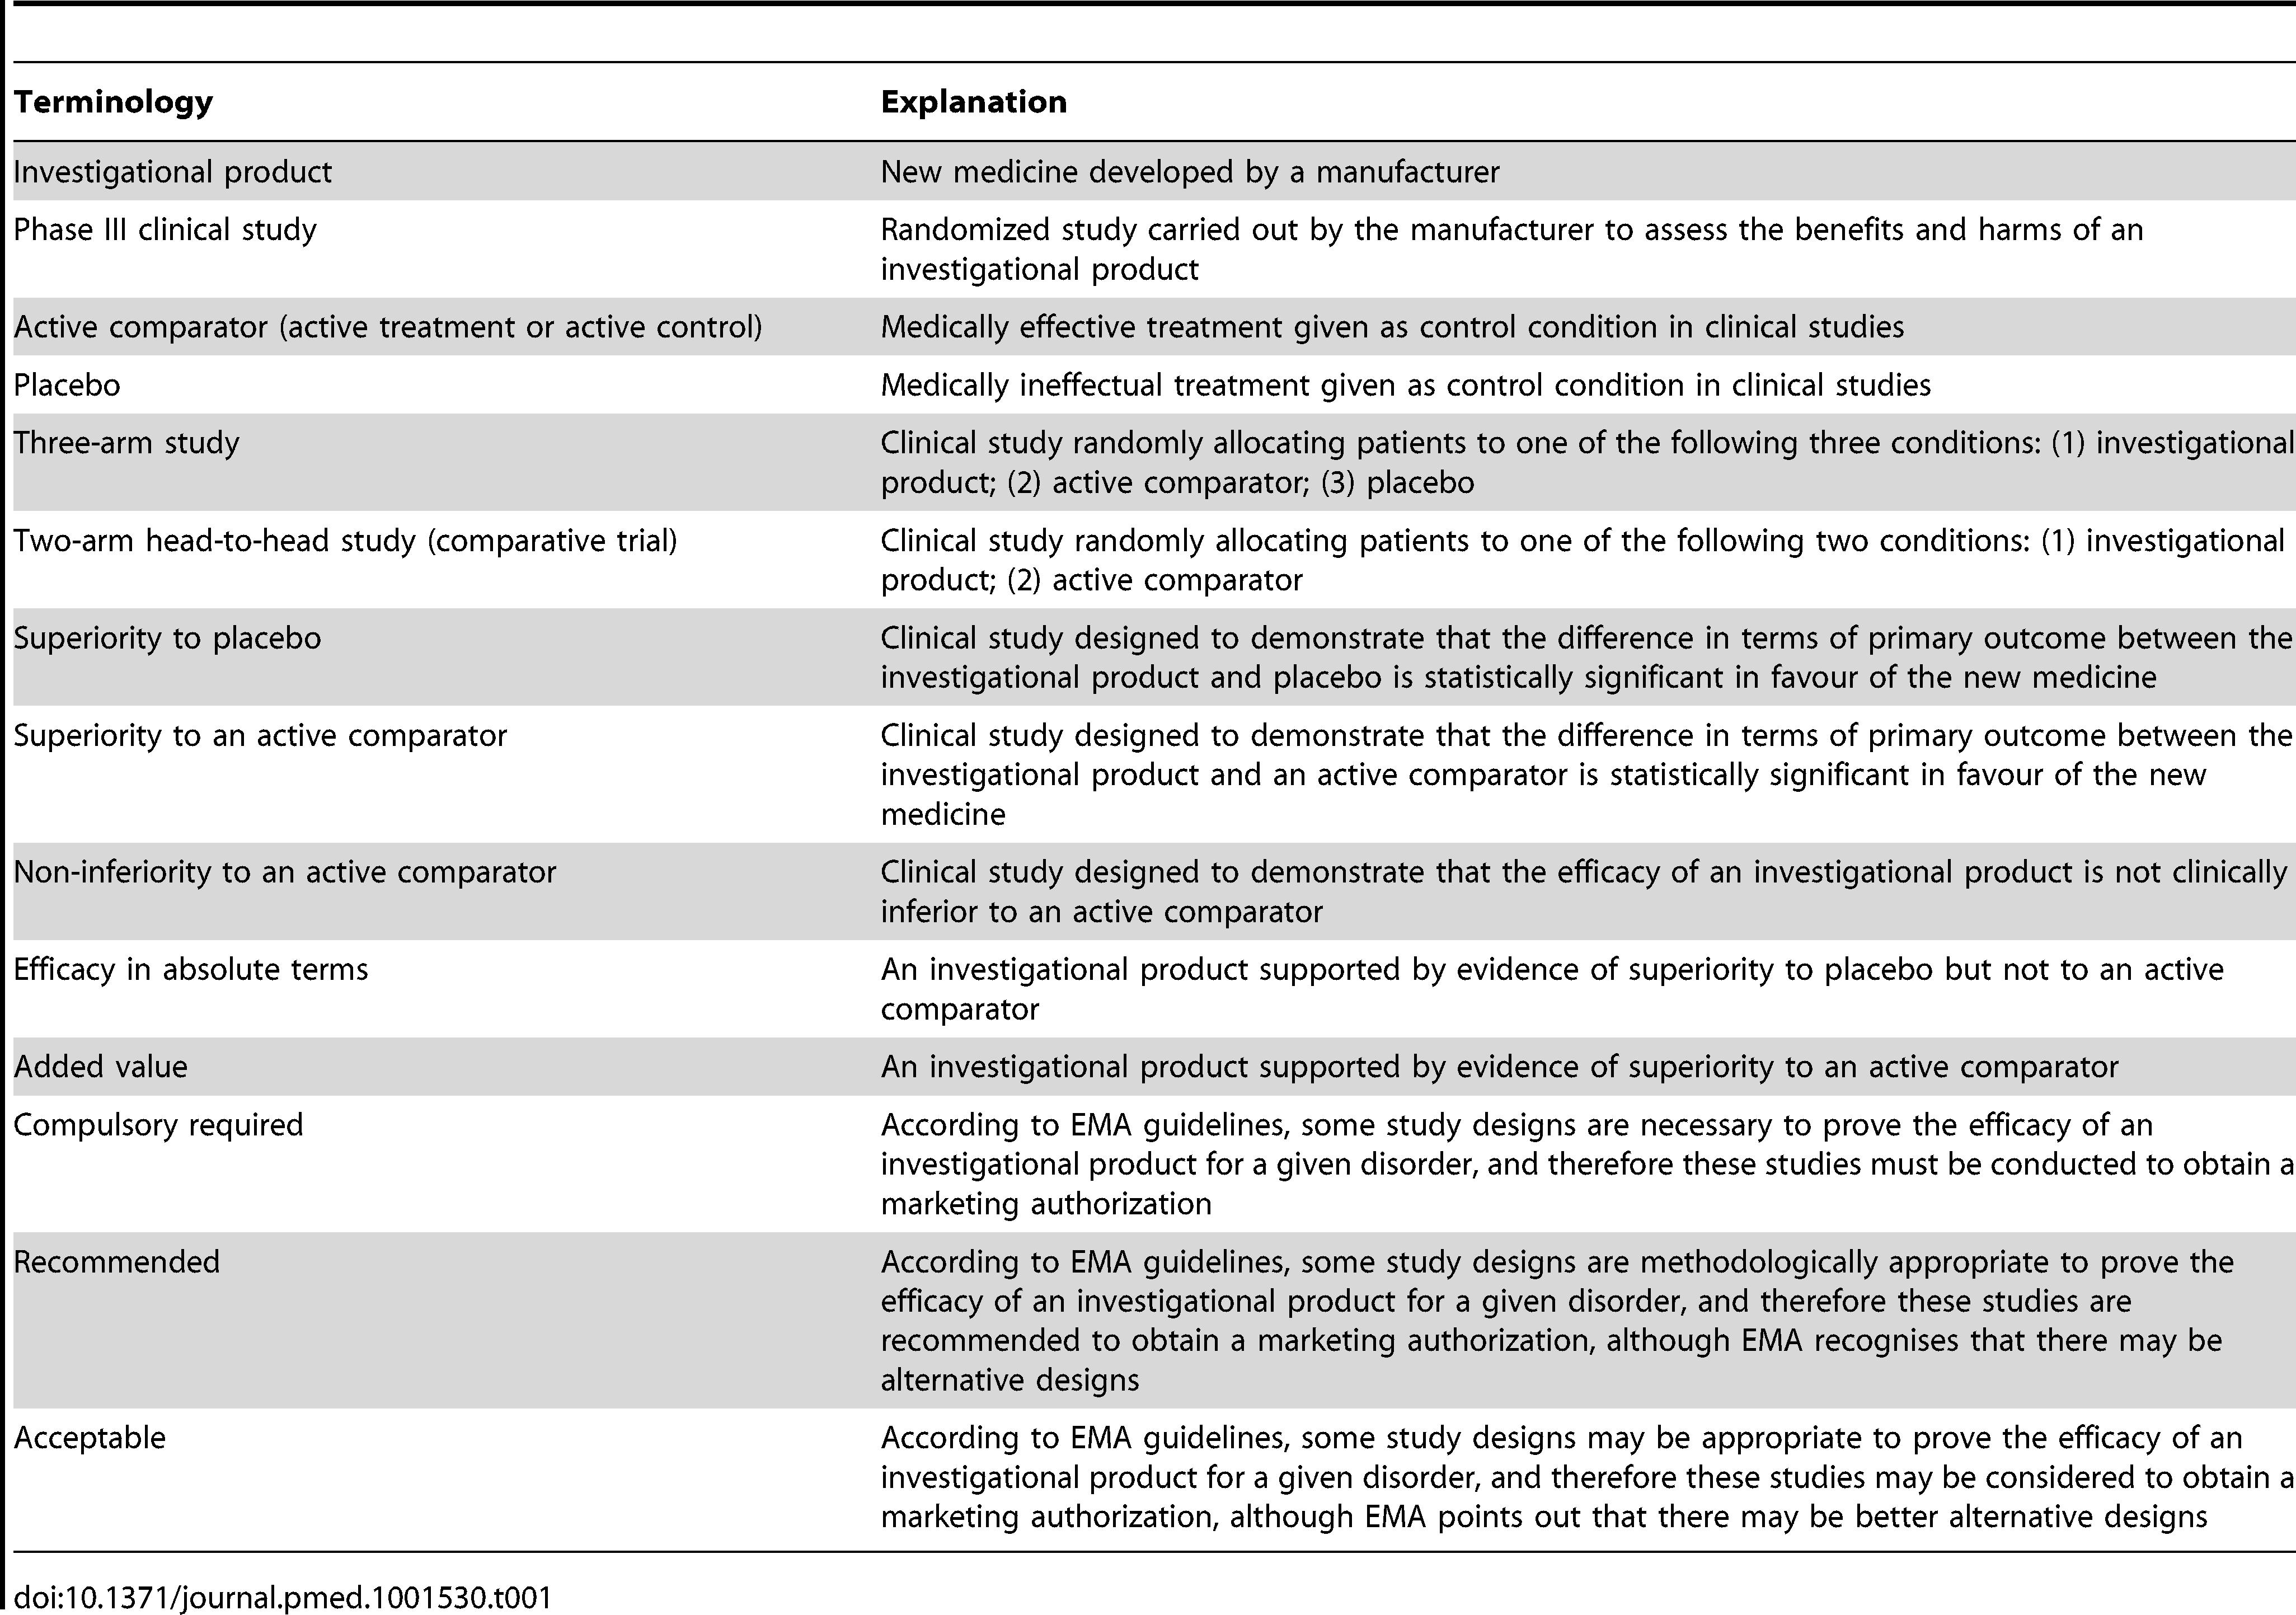 Table 1. Glossary of Regulatory Terminology